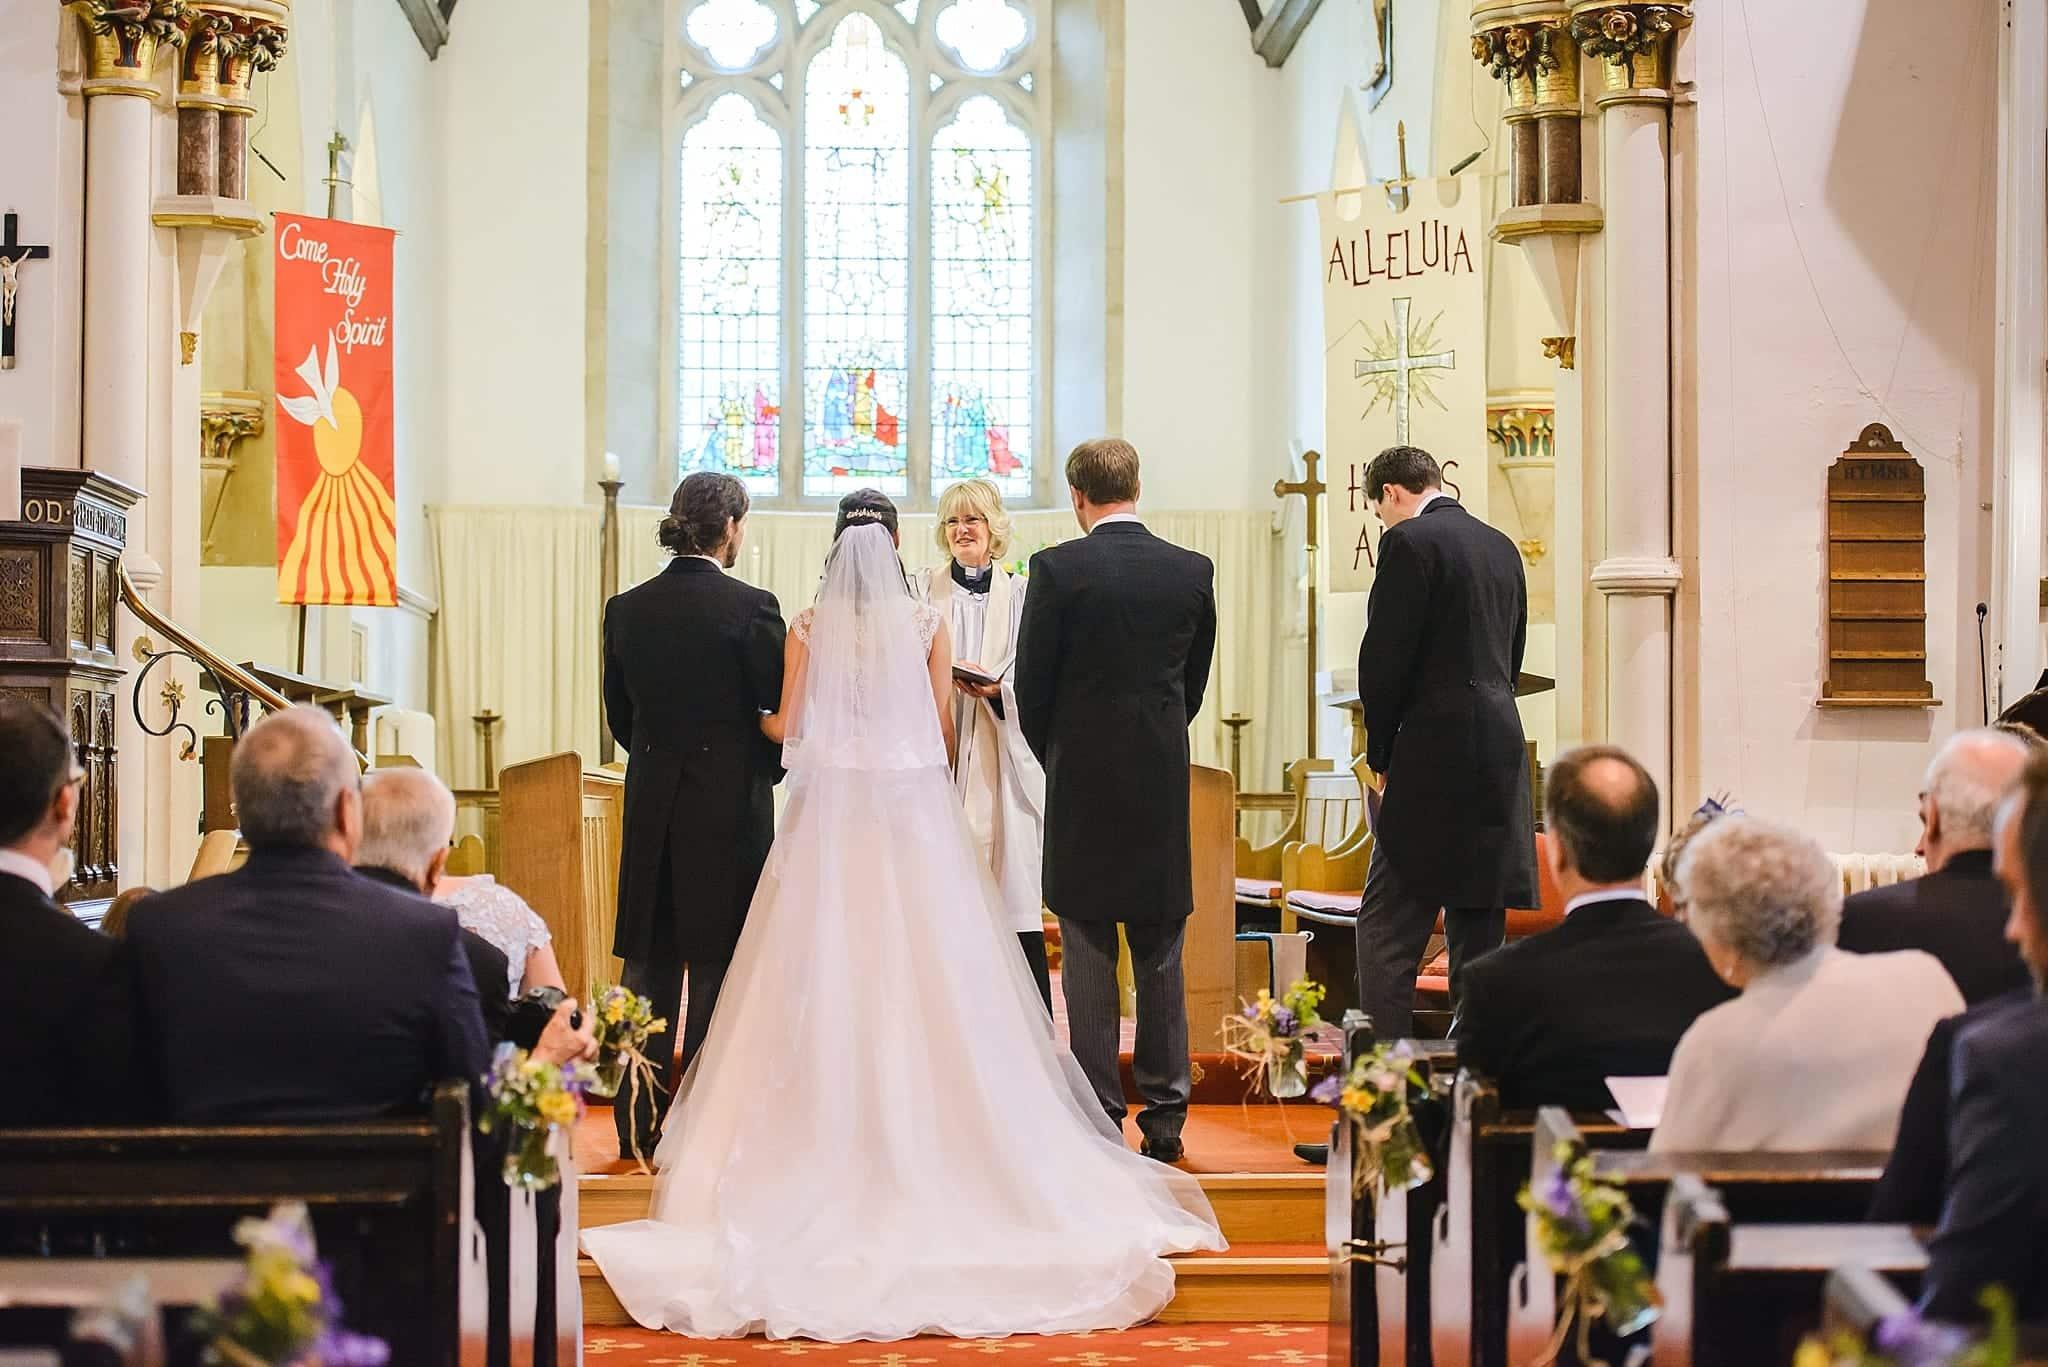 wedding service at St Swithins church, Bathford